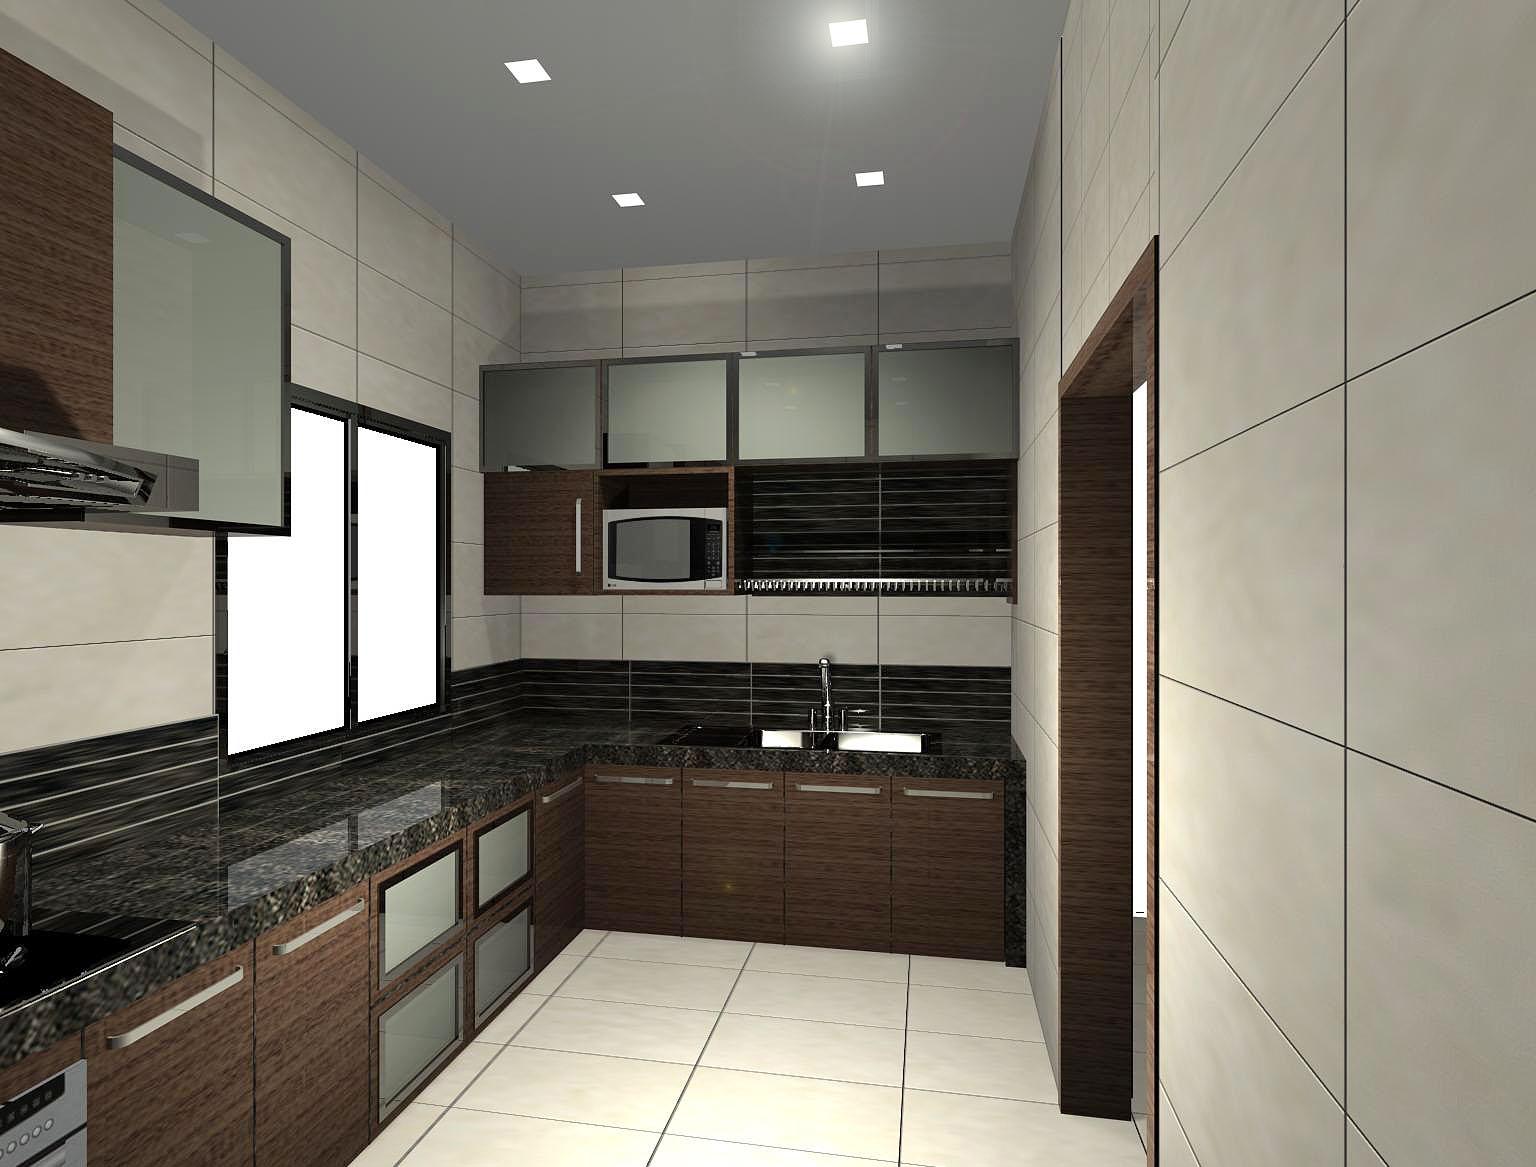 mica interior design construction kitchen cabinet mica interior design construction kitchen cabinet